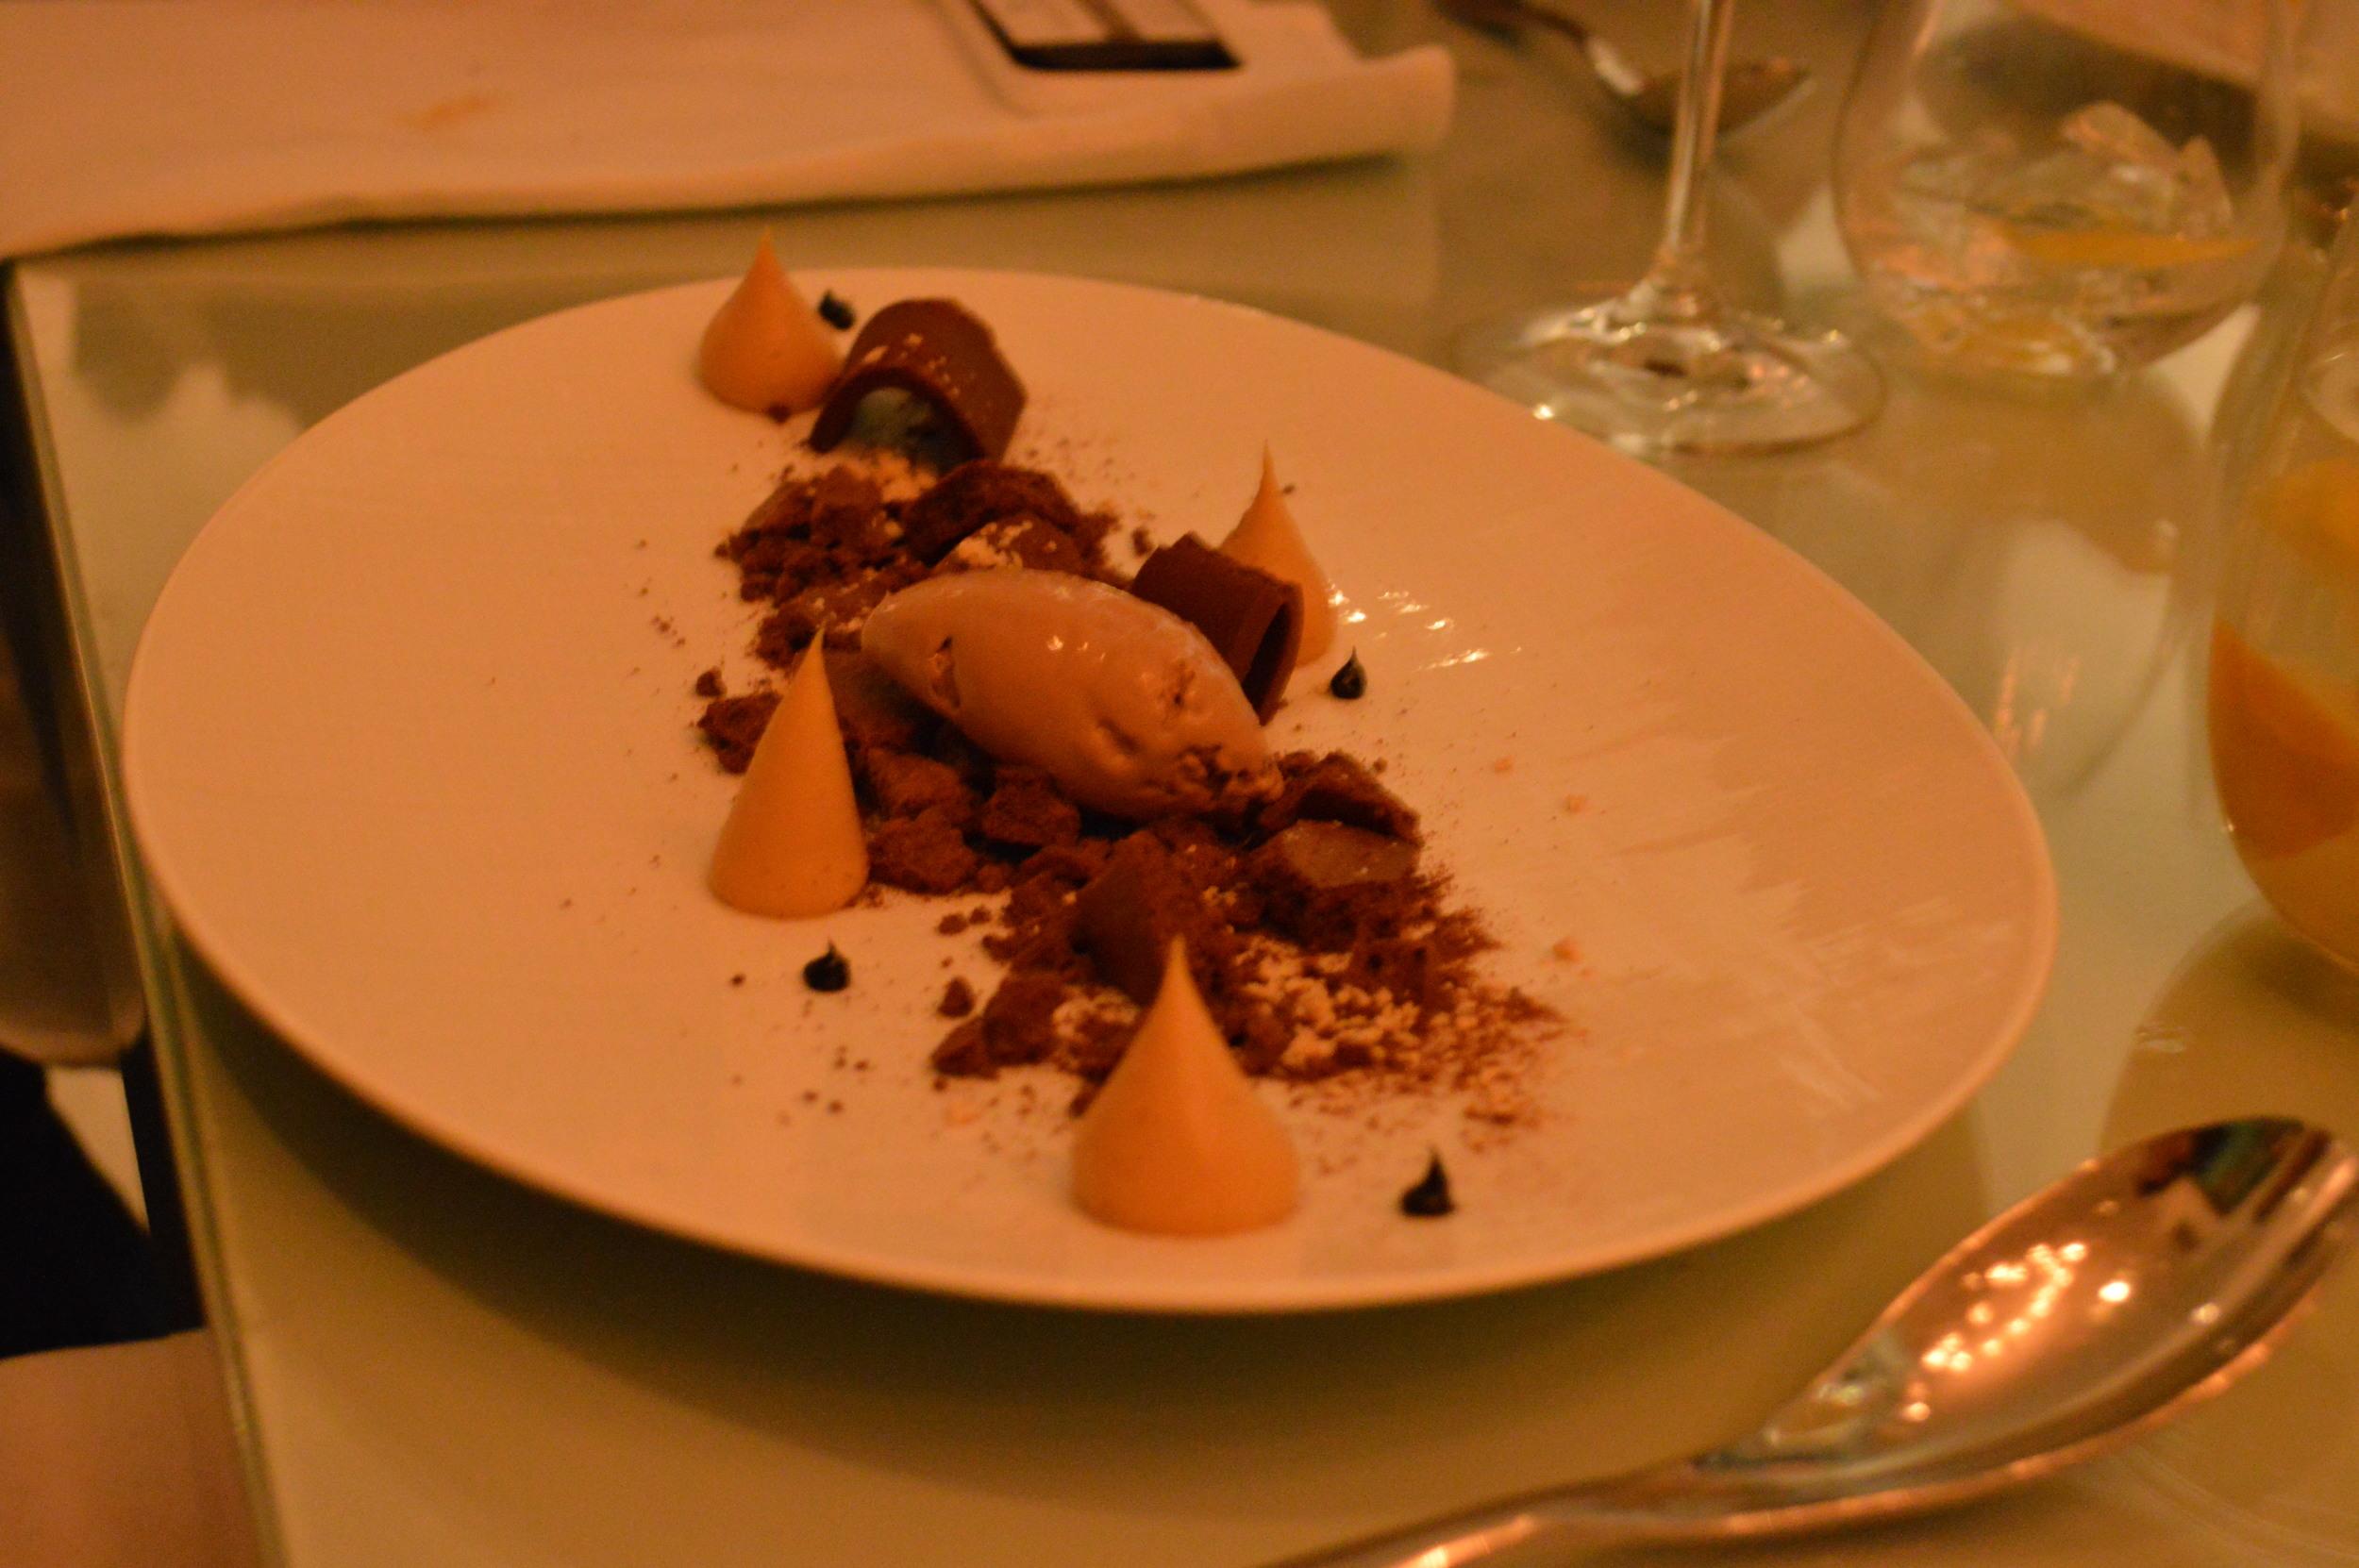 Spoon Dessert